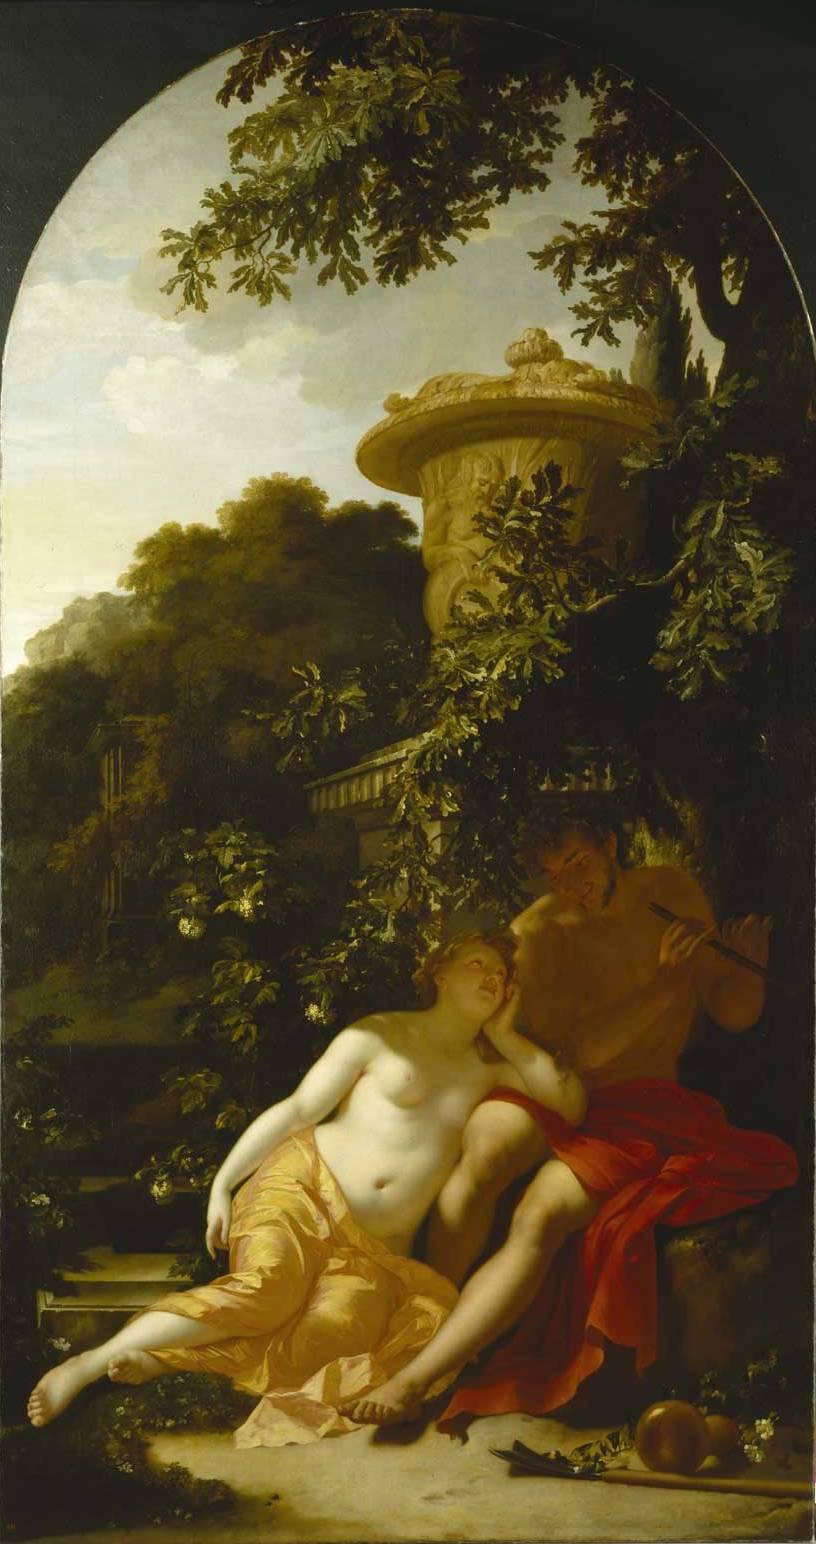 Adriaen van der Werff, Shepherd and shepherdess, ca. 1696. Kassel, Gemäldegalerie Alte Meister